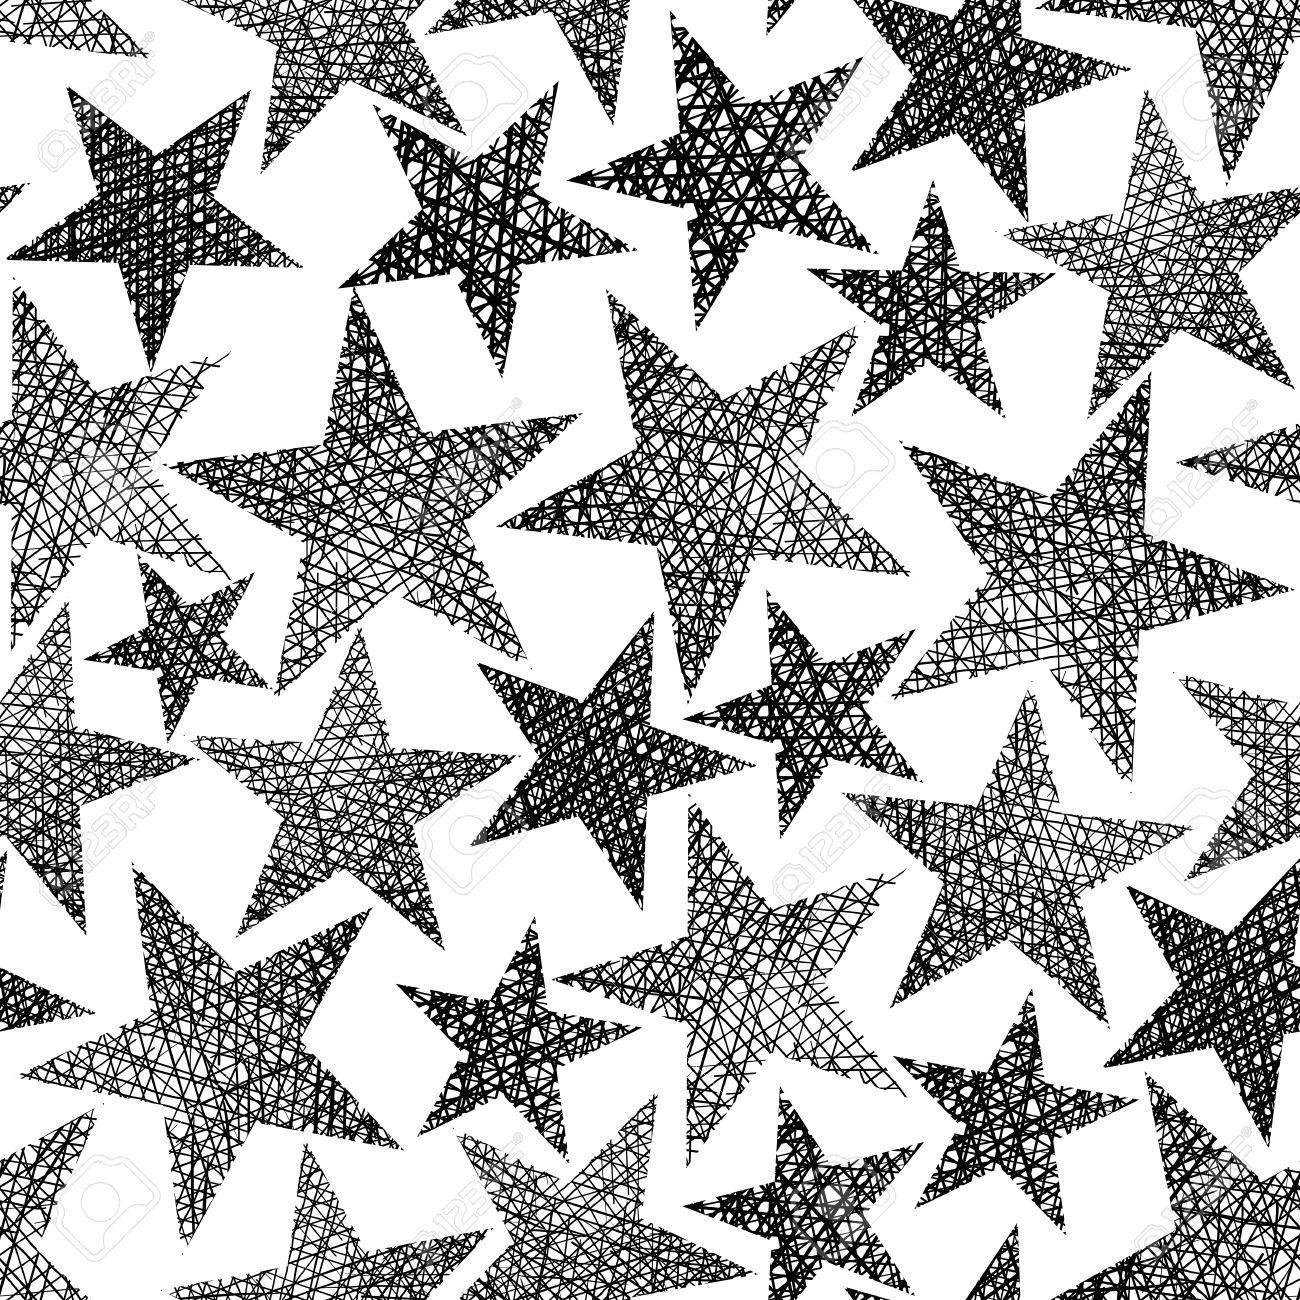 619c91c5e1b5e Estrellas sin patrón